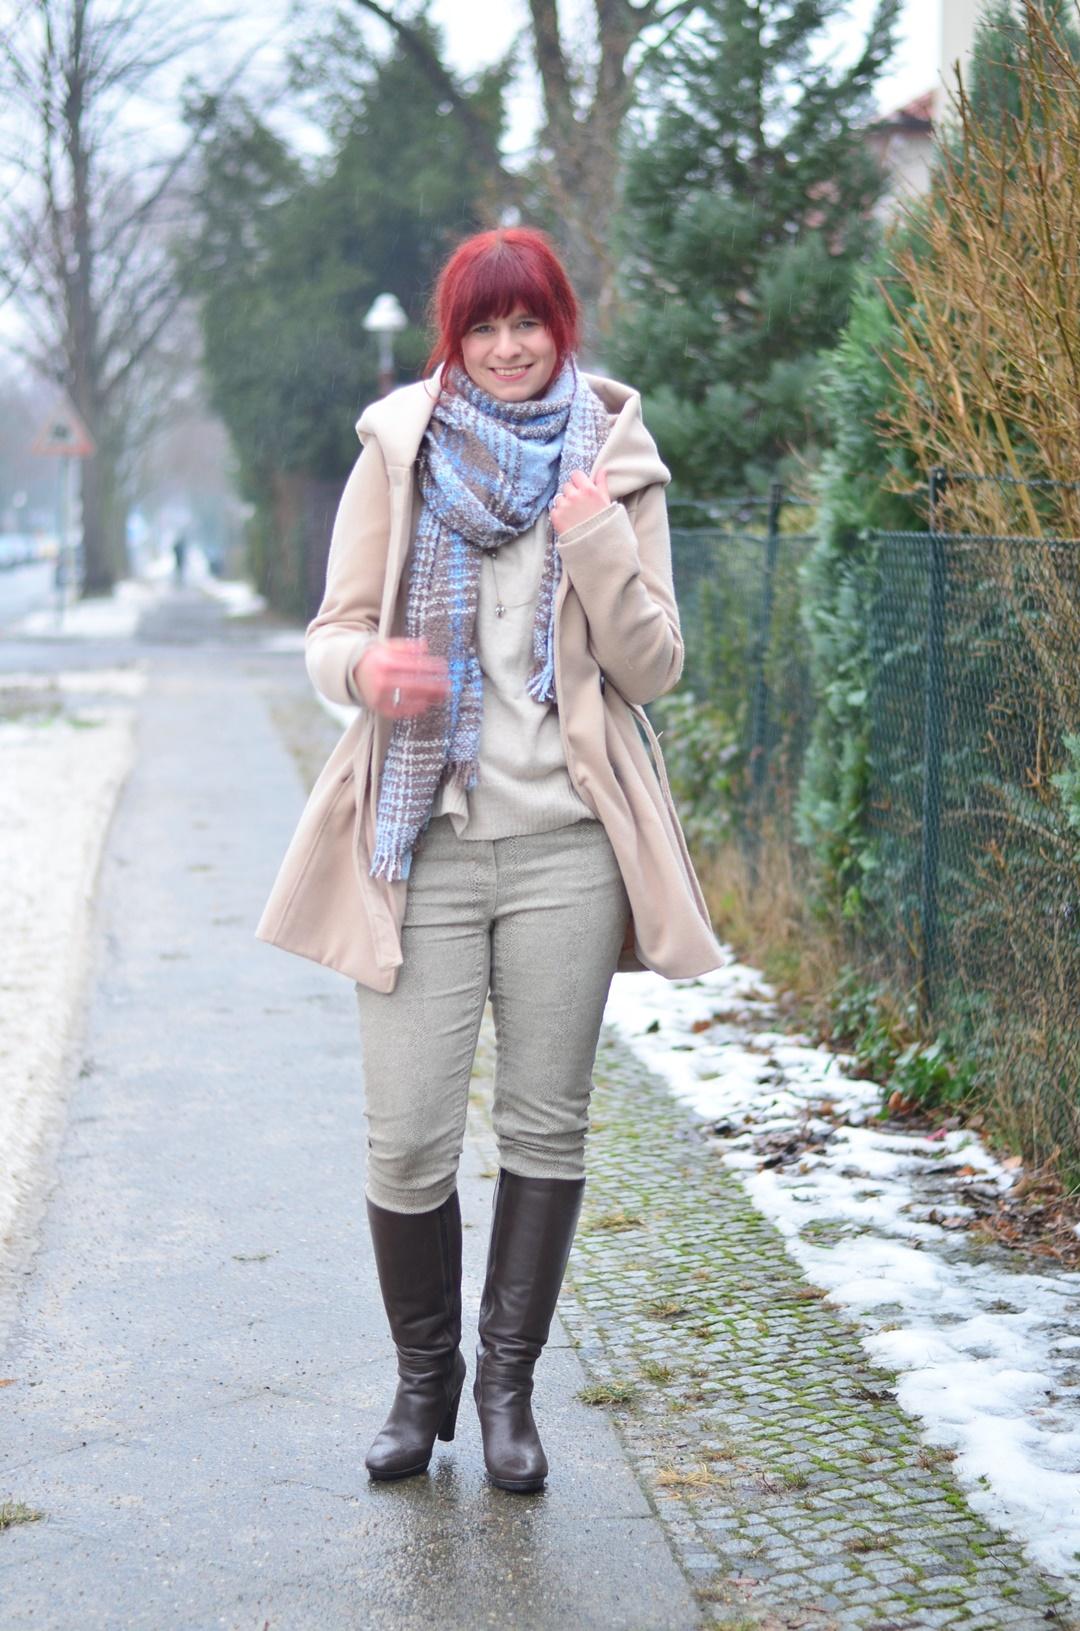 outfitpost_fashionblog_annanikabu_fashion_herbstoutfit_braune-stiefel_poncho_braunschweig-7